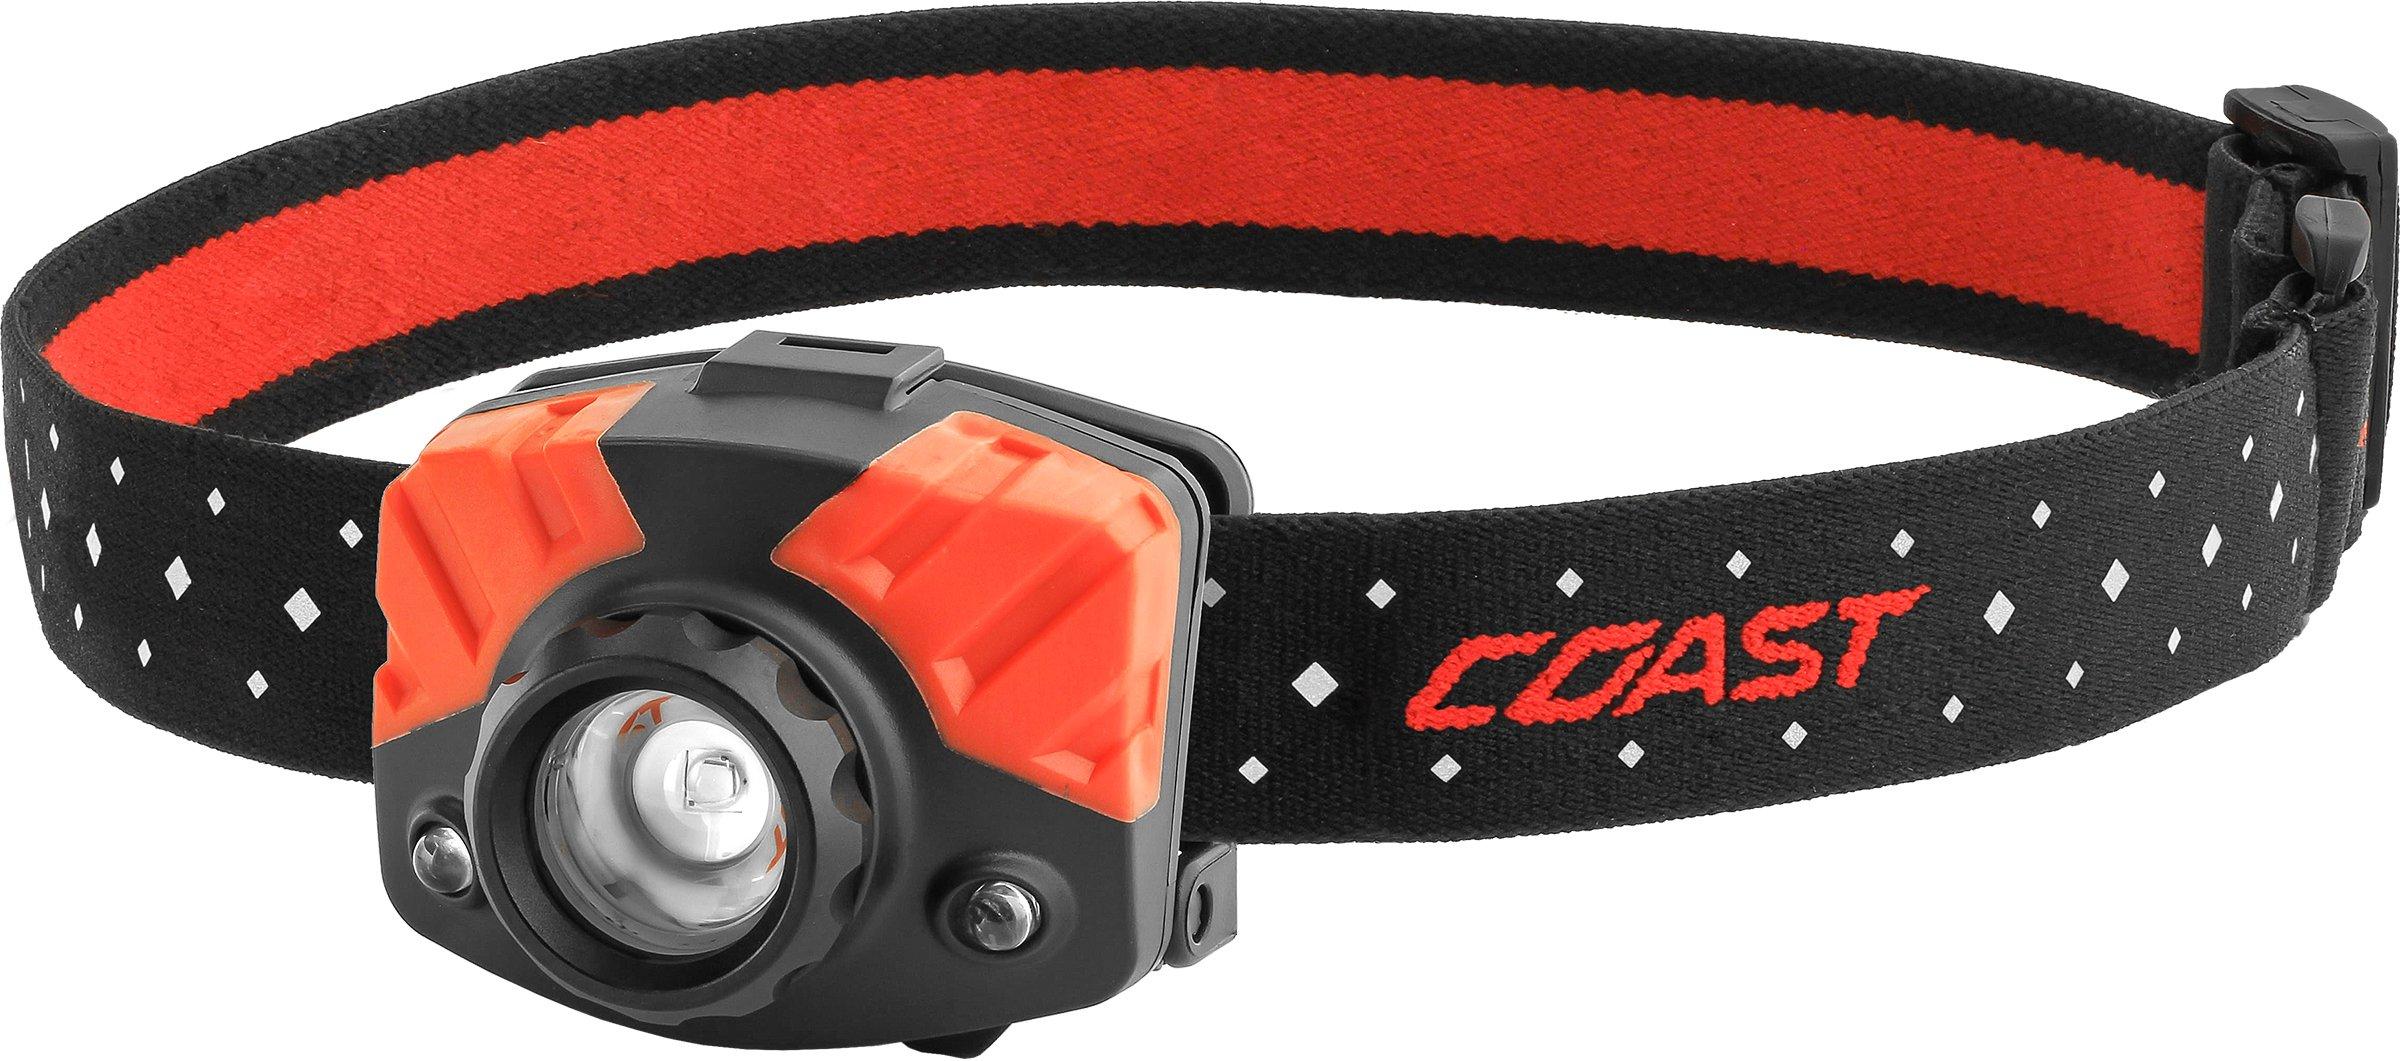 COAST FL75 435 Lumen Dual Color Focusing LED Headlamp, Black